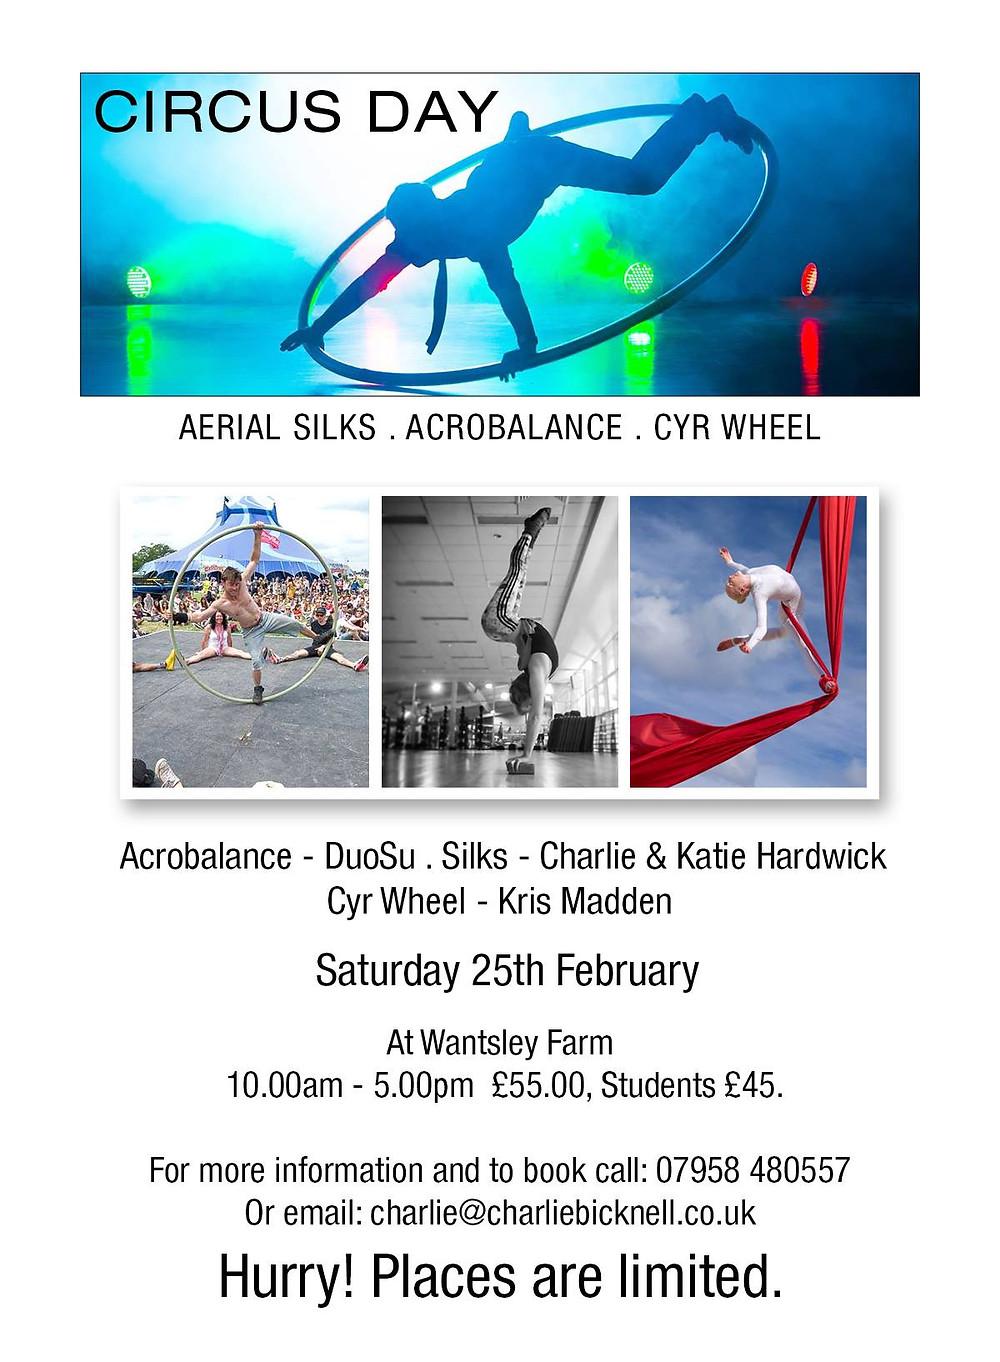 Wantsley Farm Circus Day February 2017